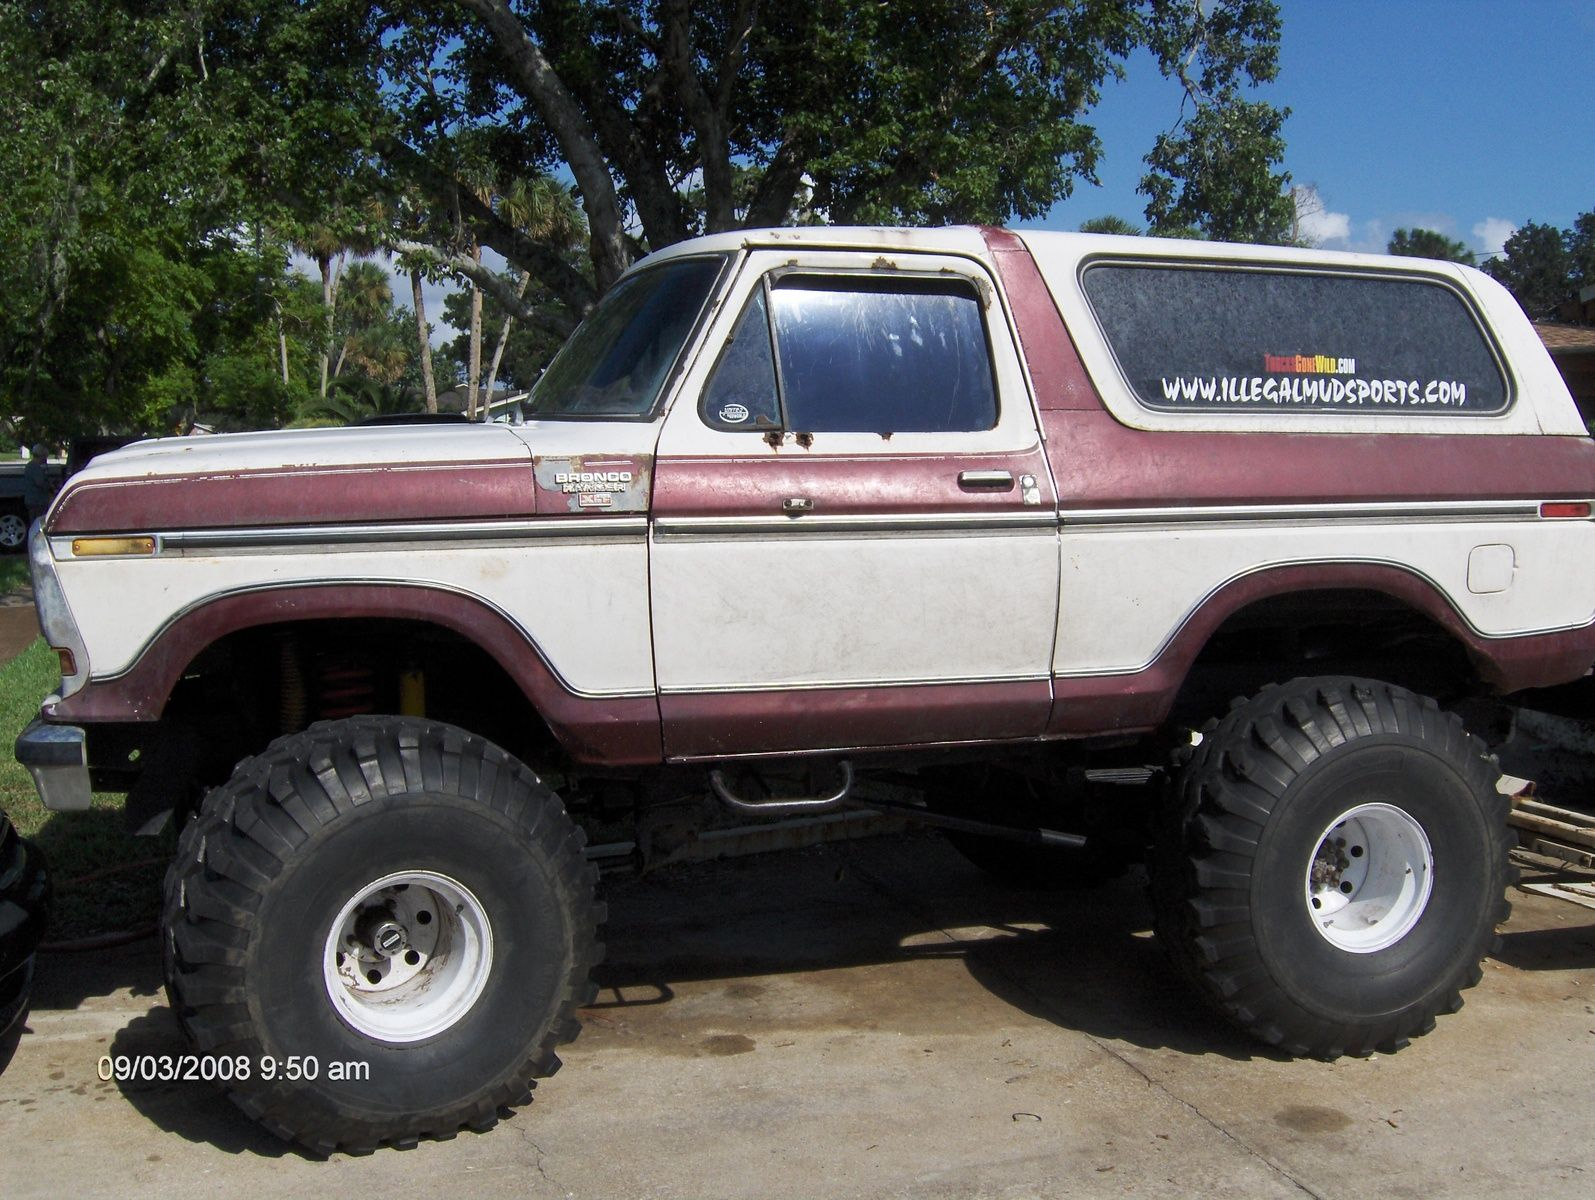 Ford Bronco.. Ford bronco, 1979 ford bronco, Lifted ford